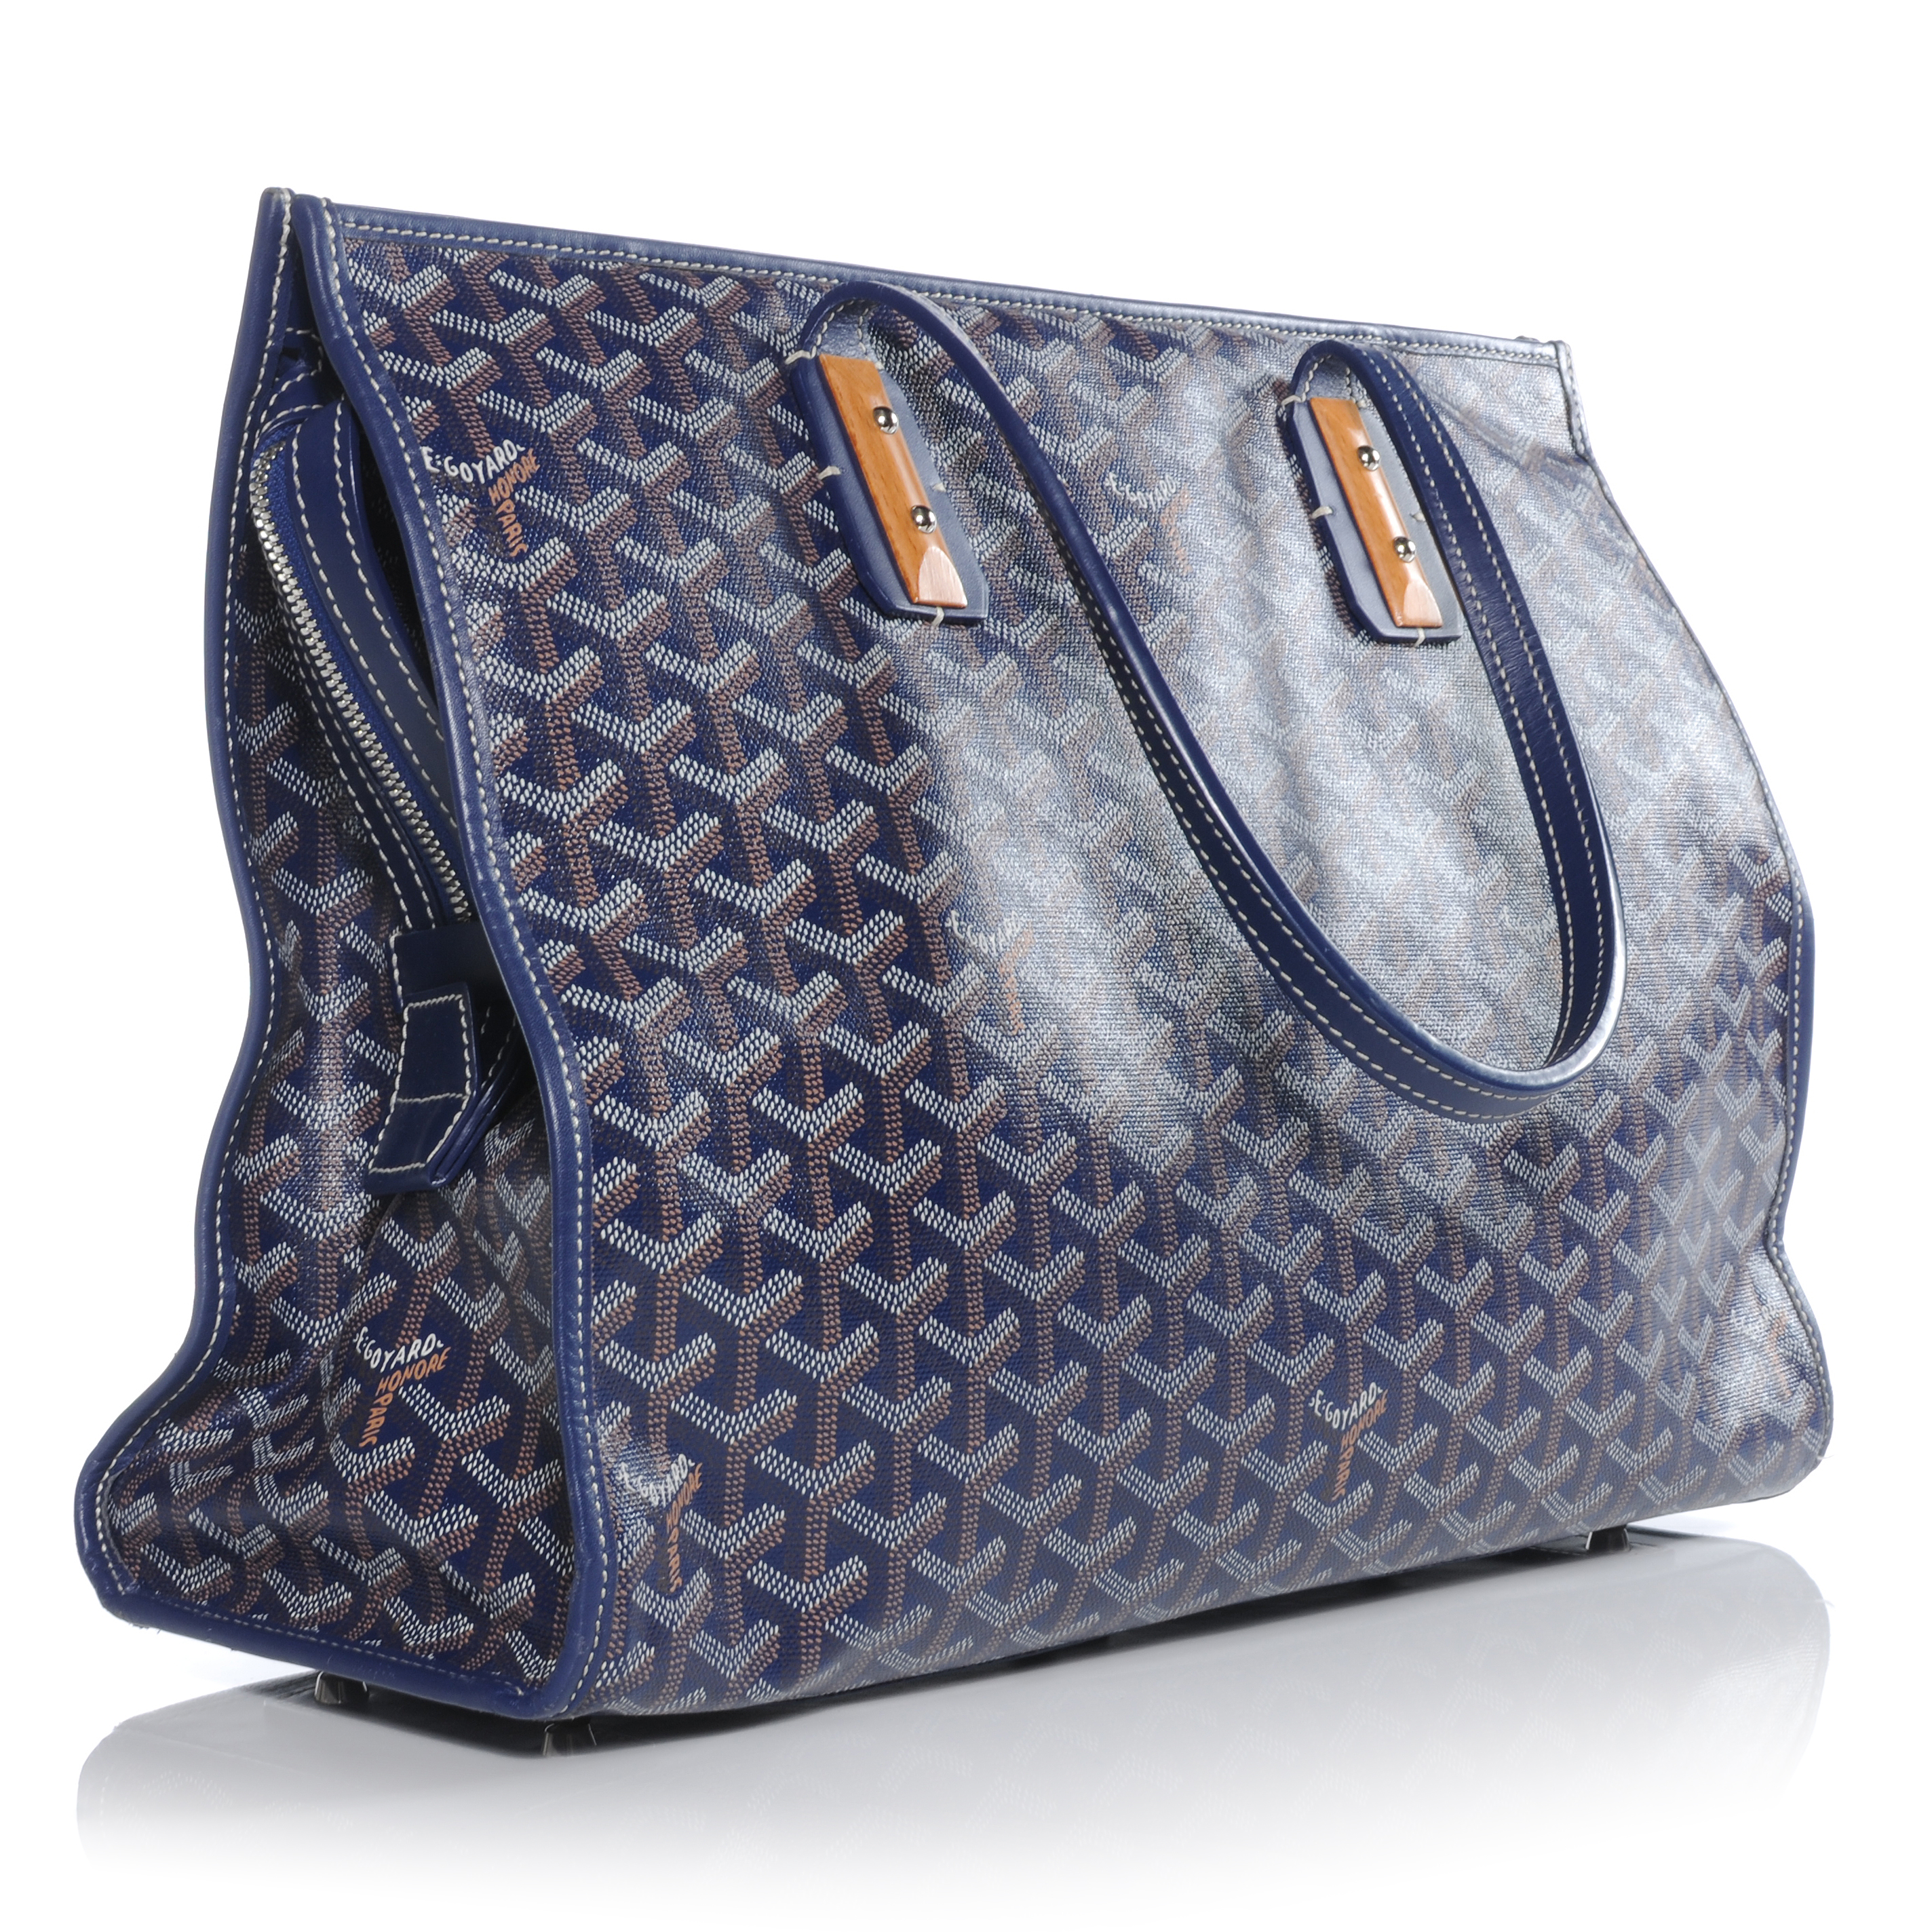 Top 3 Designer Bags That Double as a Diaper BagLegos in my ...